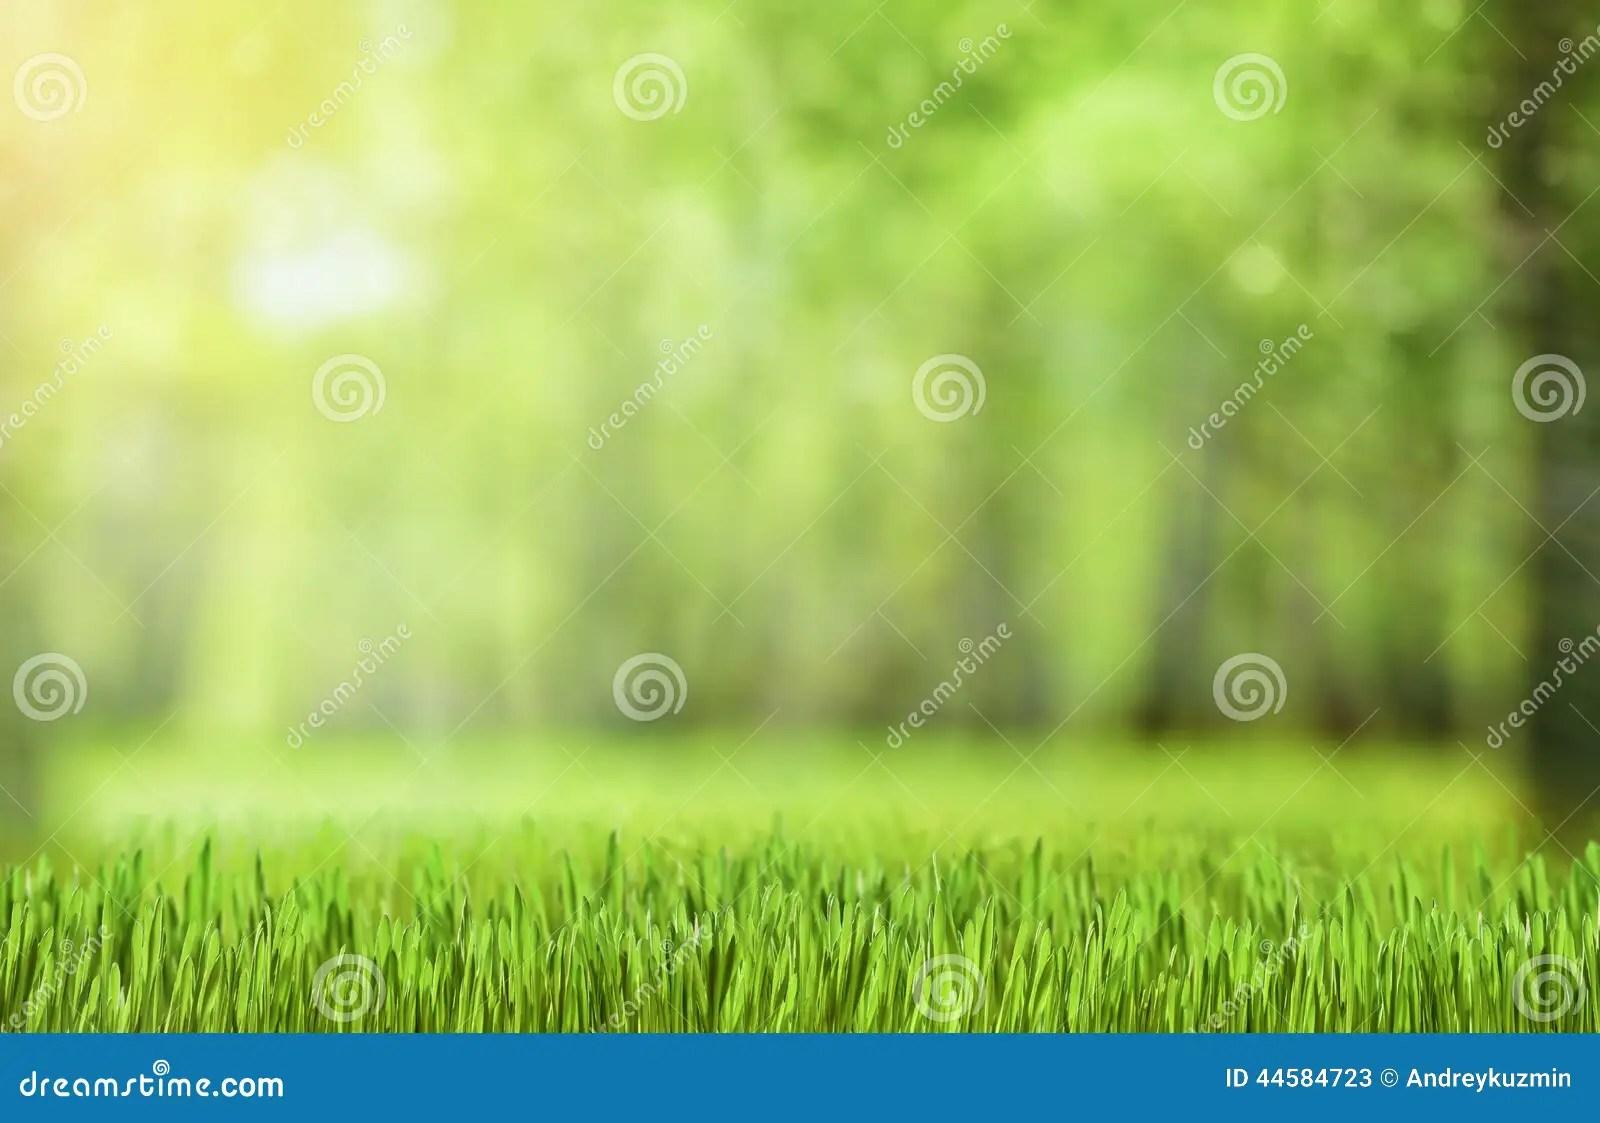 Wallpaper Primavera Hd 自然绿色森林背景 库存图片 图片 包括有 Defocus 森林 自然 抽象 模式 蓝蓝